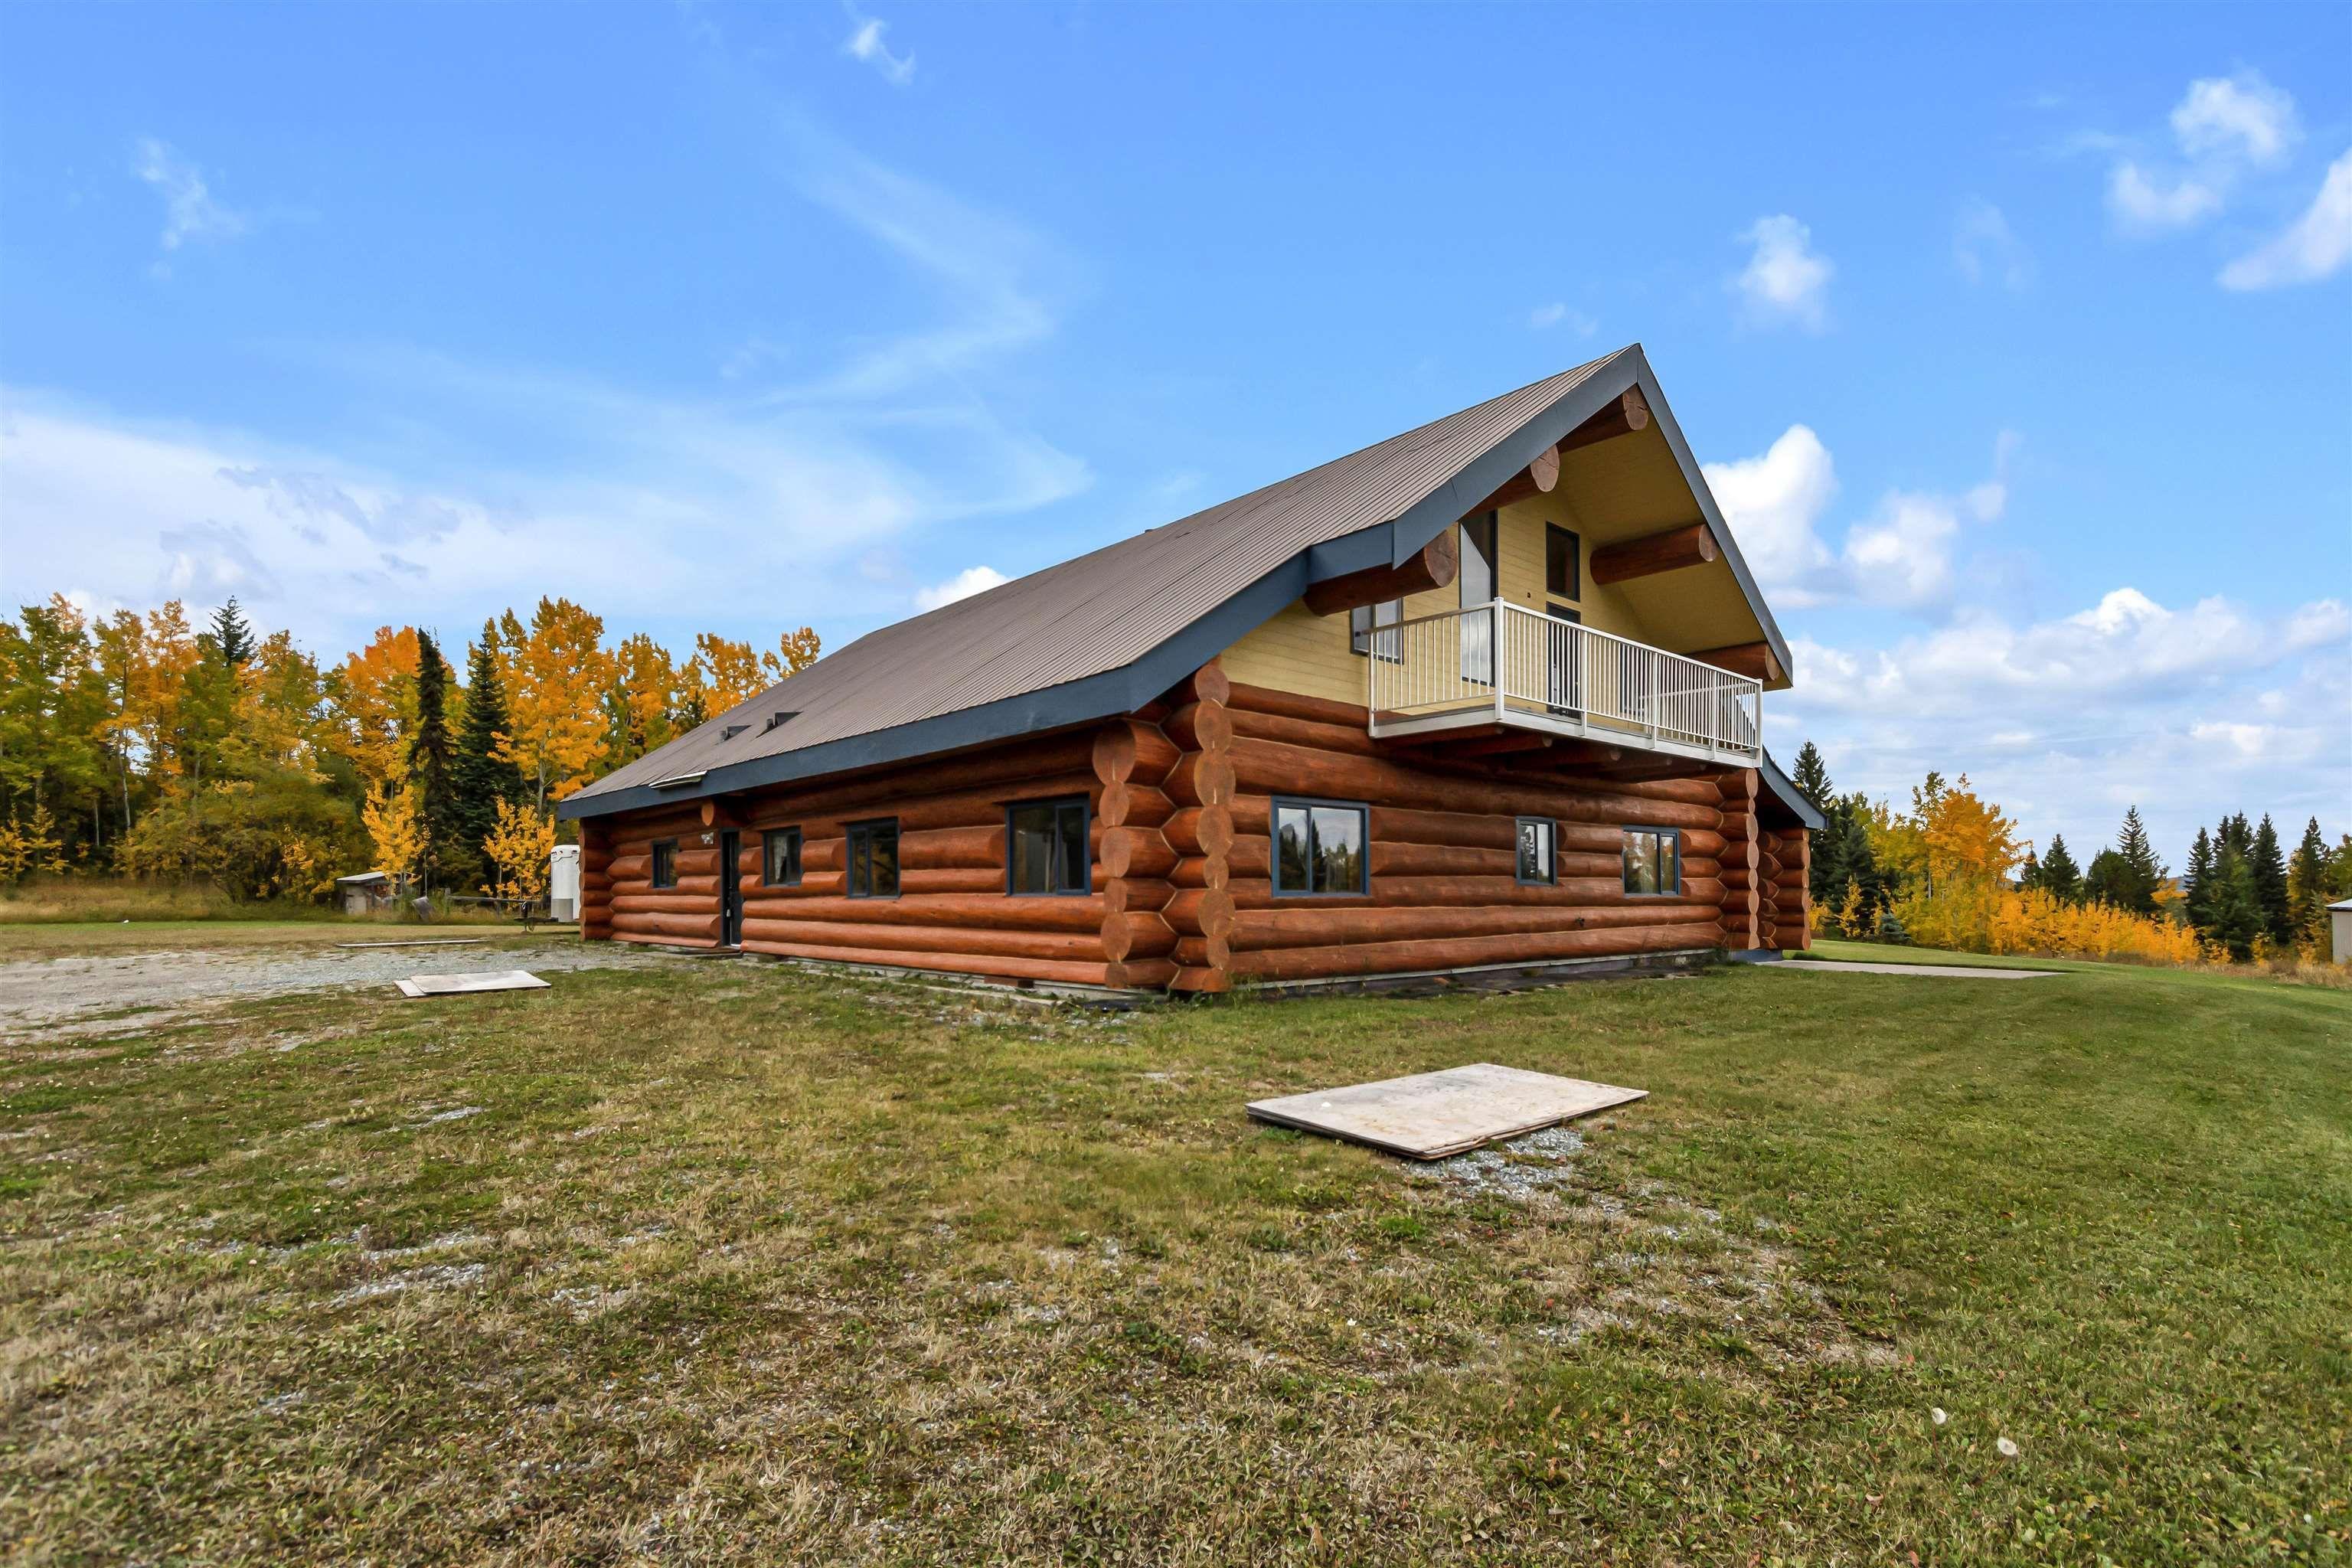 Main Photo: 9770 W 16 Highway in Prince George: Upper Mud House for sale (PG Rural West (Zone 77))  : MLS®# R2620264